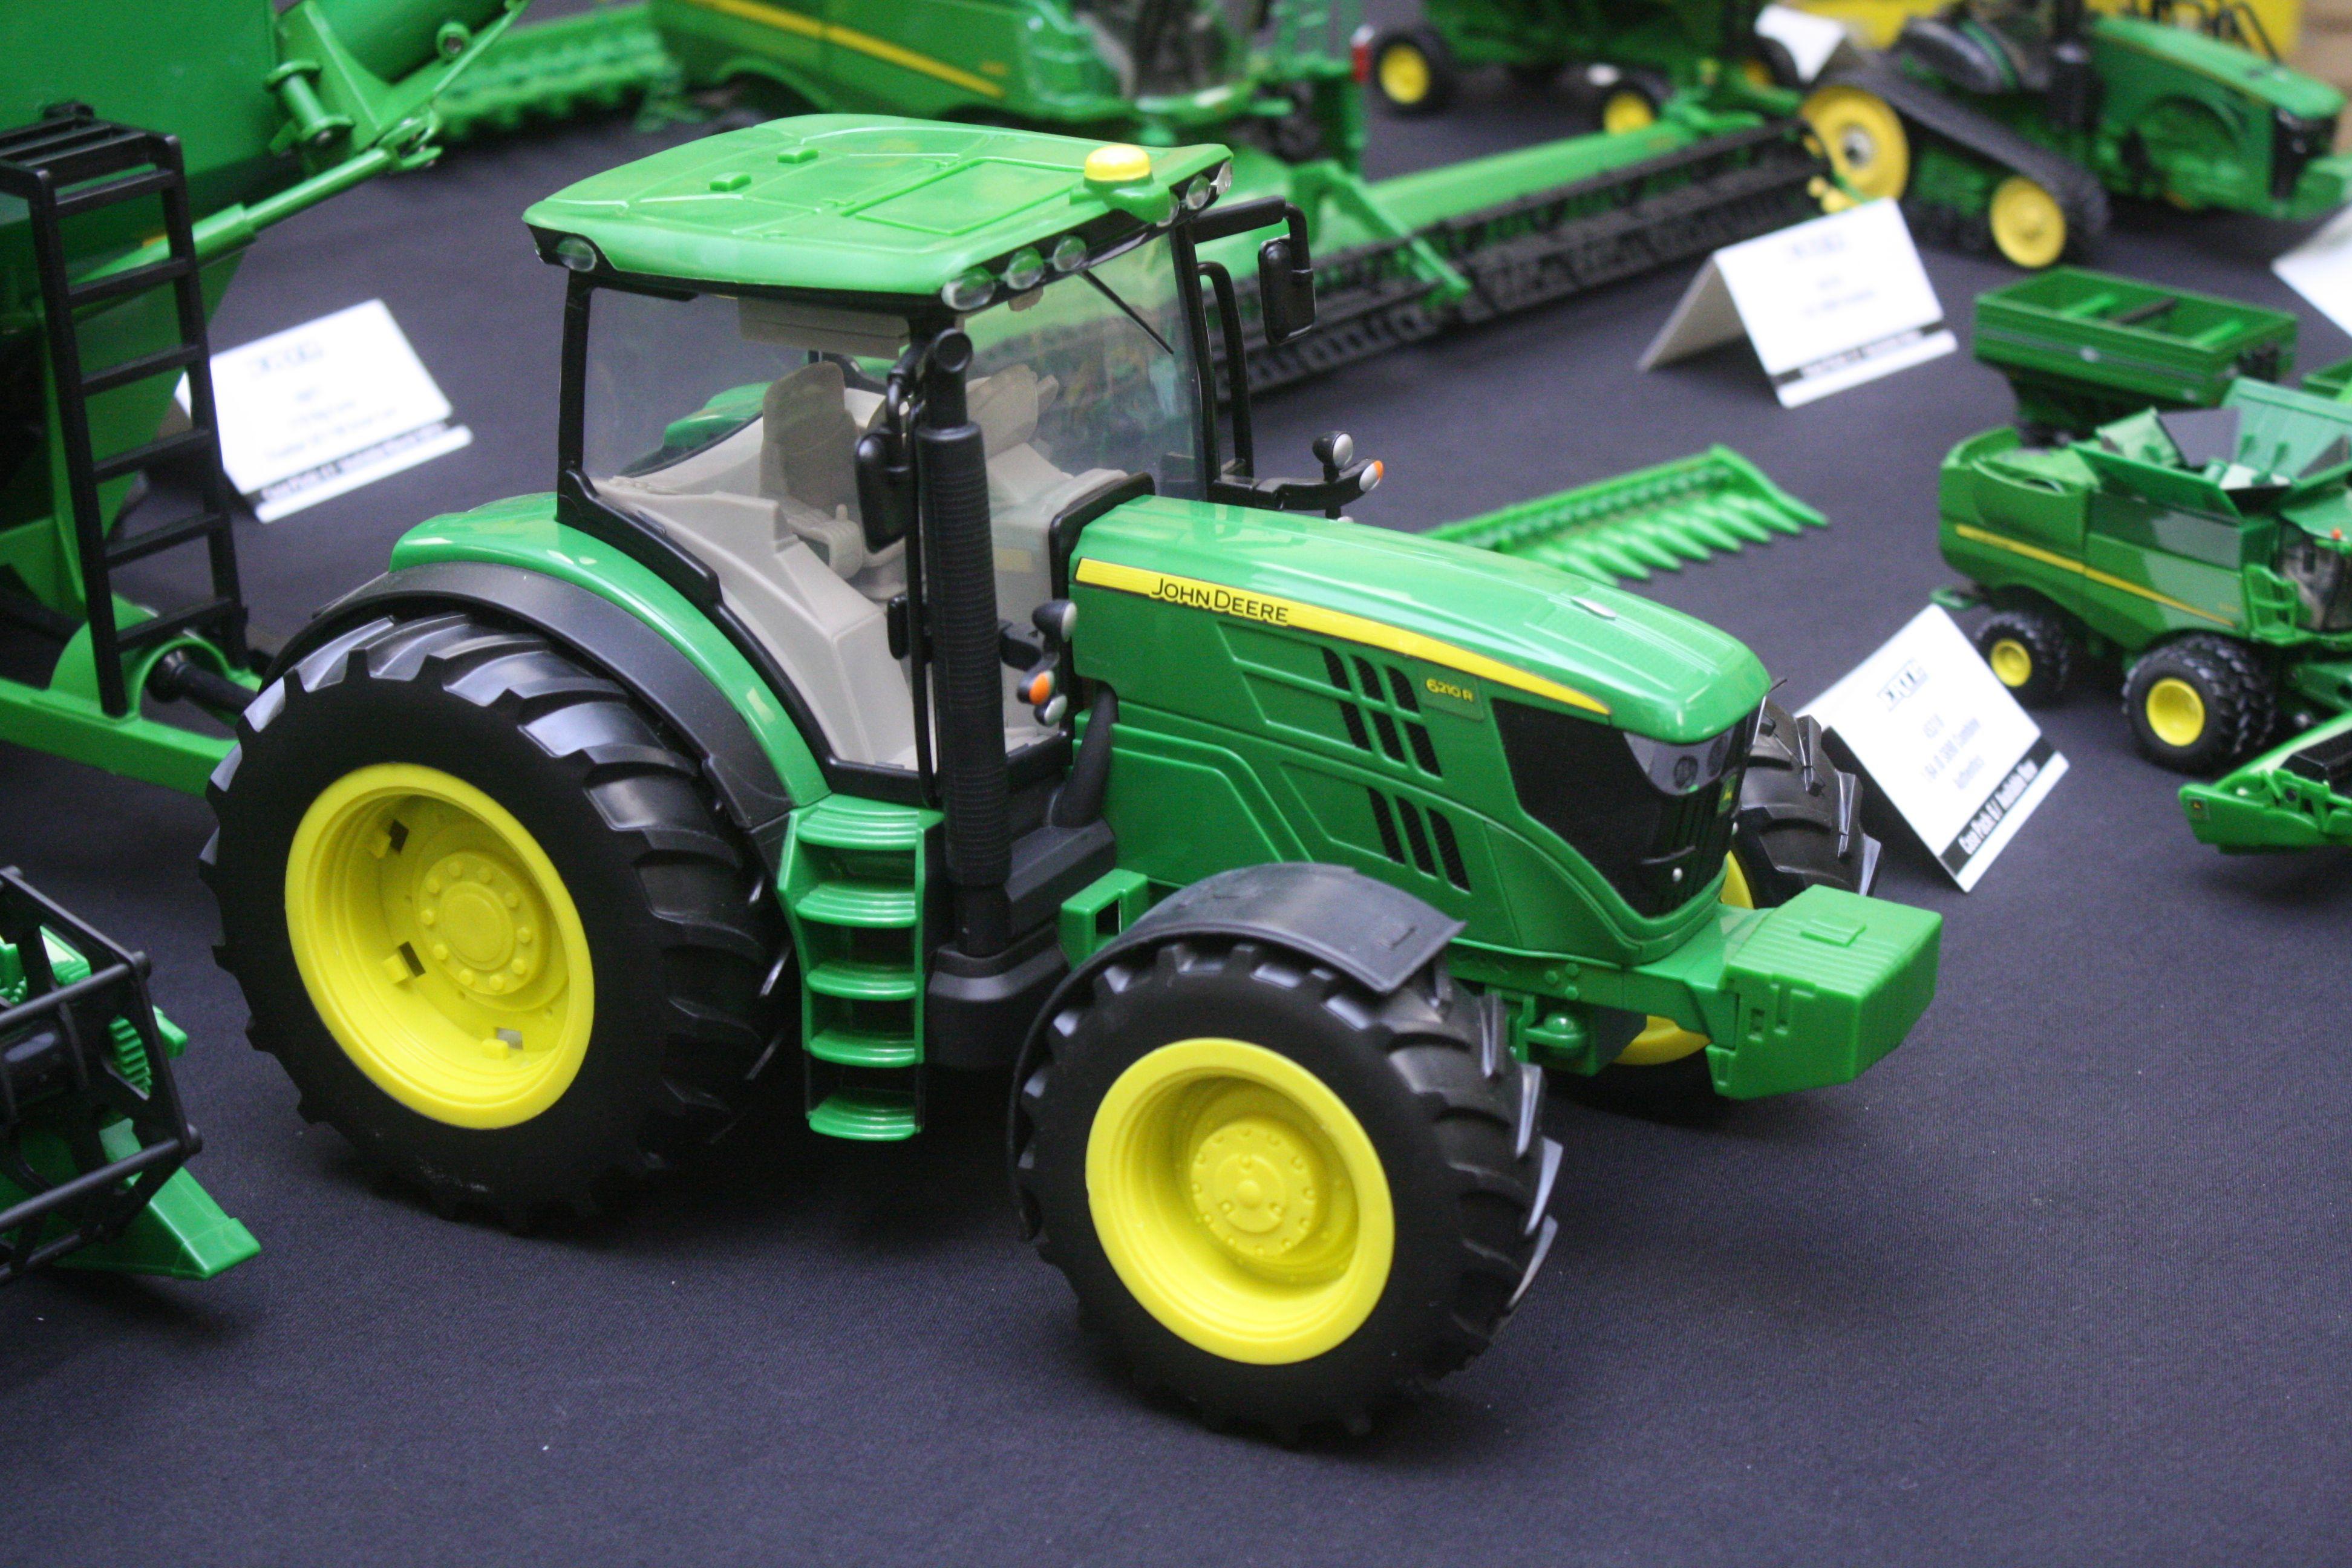 Big farm john deere 6210r by ertl toy tractors pinterest